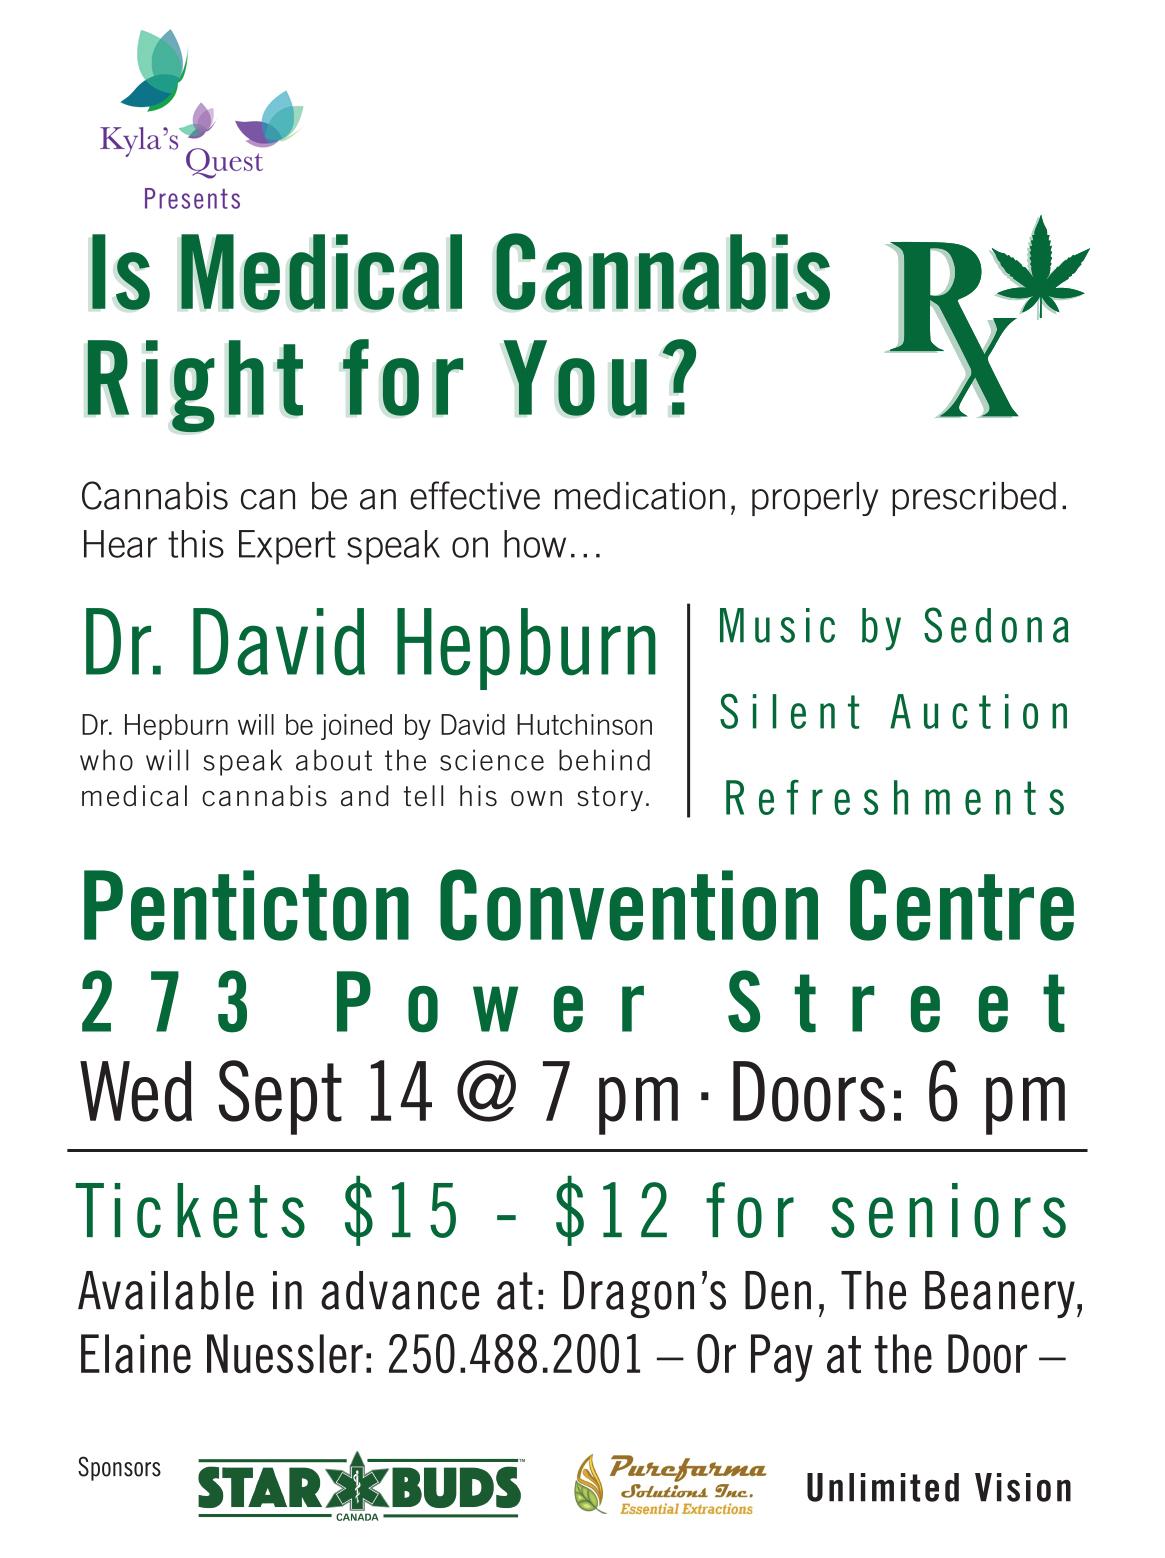 Medical Cannabis event Penticton